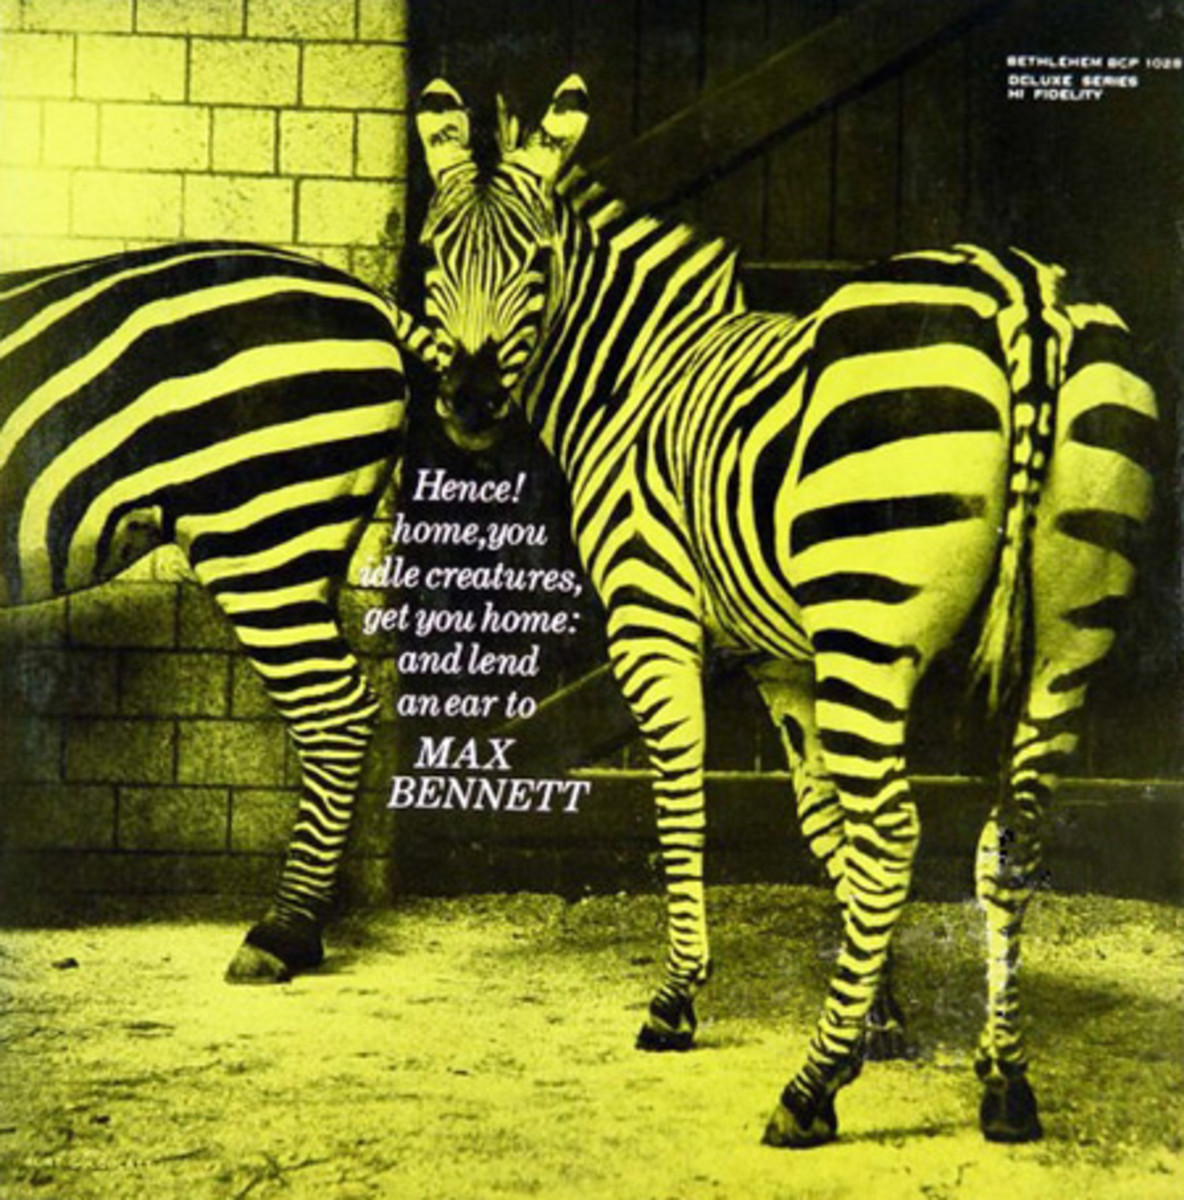 "Max Bennett Quintet with Charlie Mariano Bethlehem Records BCP 1028  10"" LP Vinyl Record (1954) Album Cover Art by Burt Goldblatt"